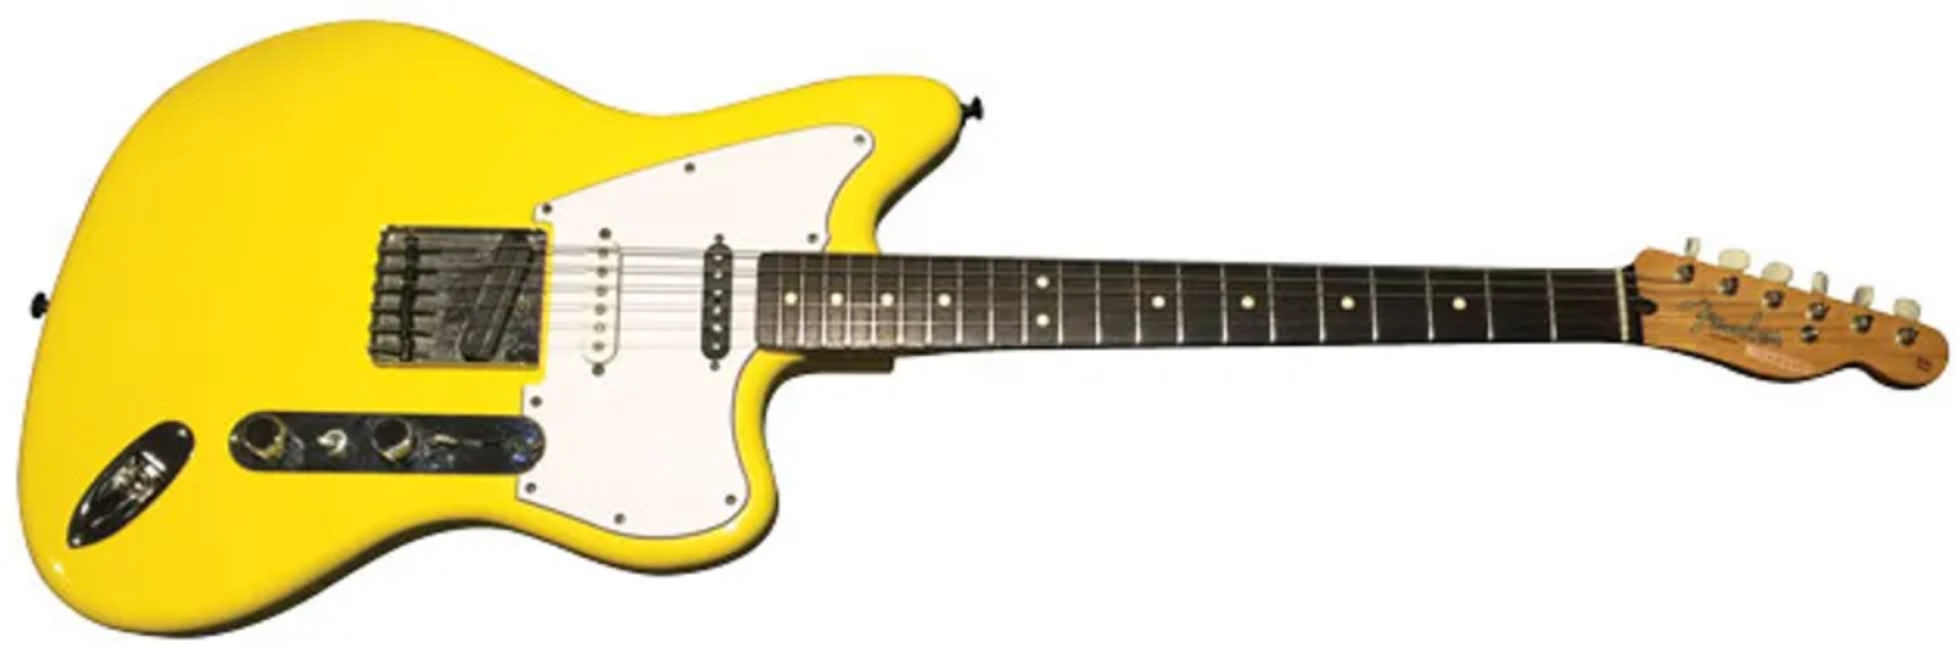 Reader Guitar of the Month: Frankenstein Jazzcaster